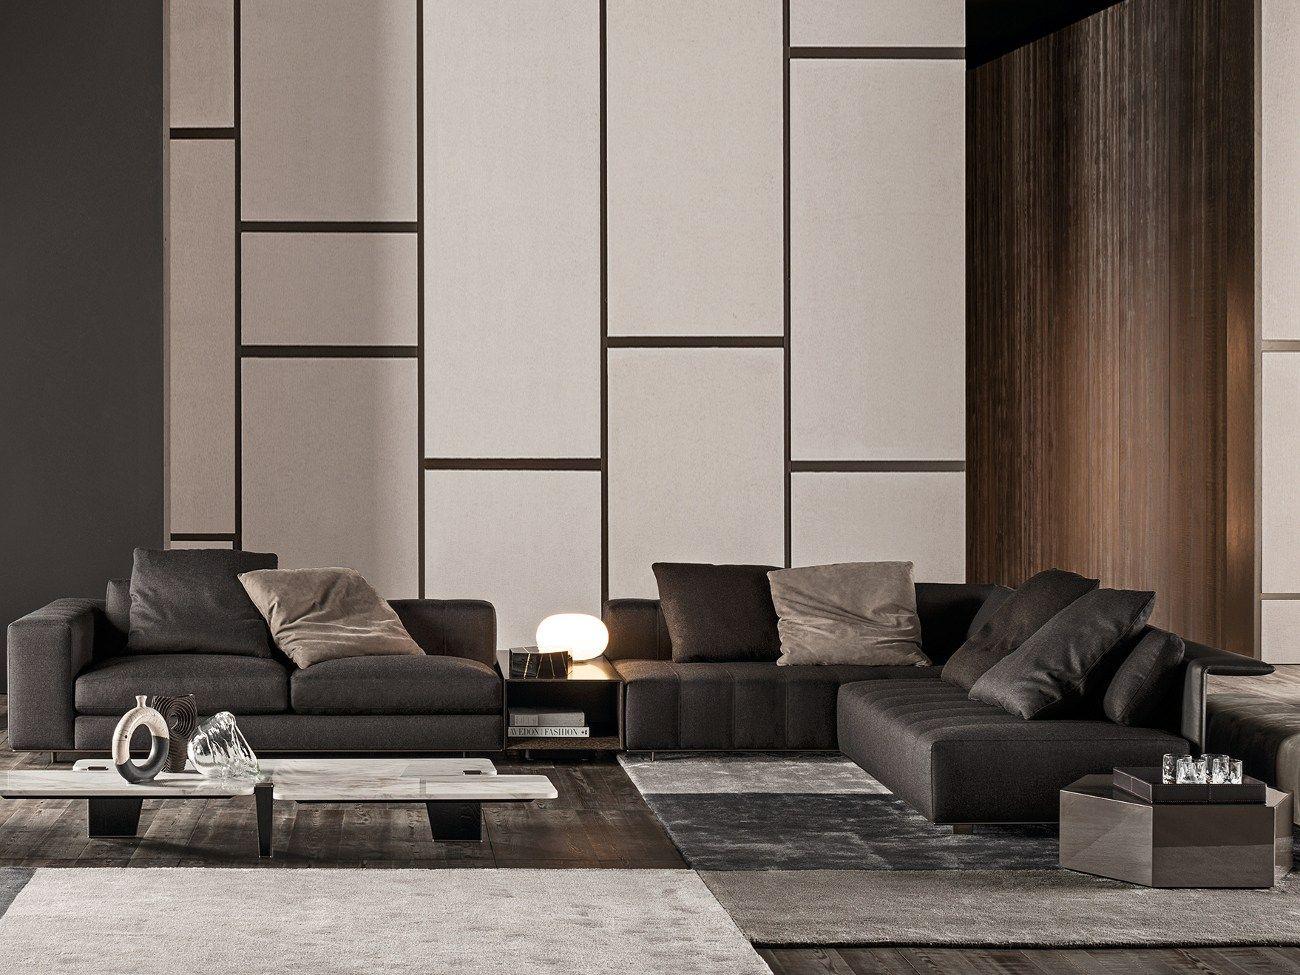 Sofa Freeman Seating System By Minotti